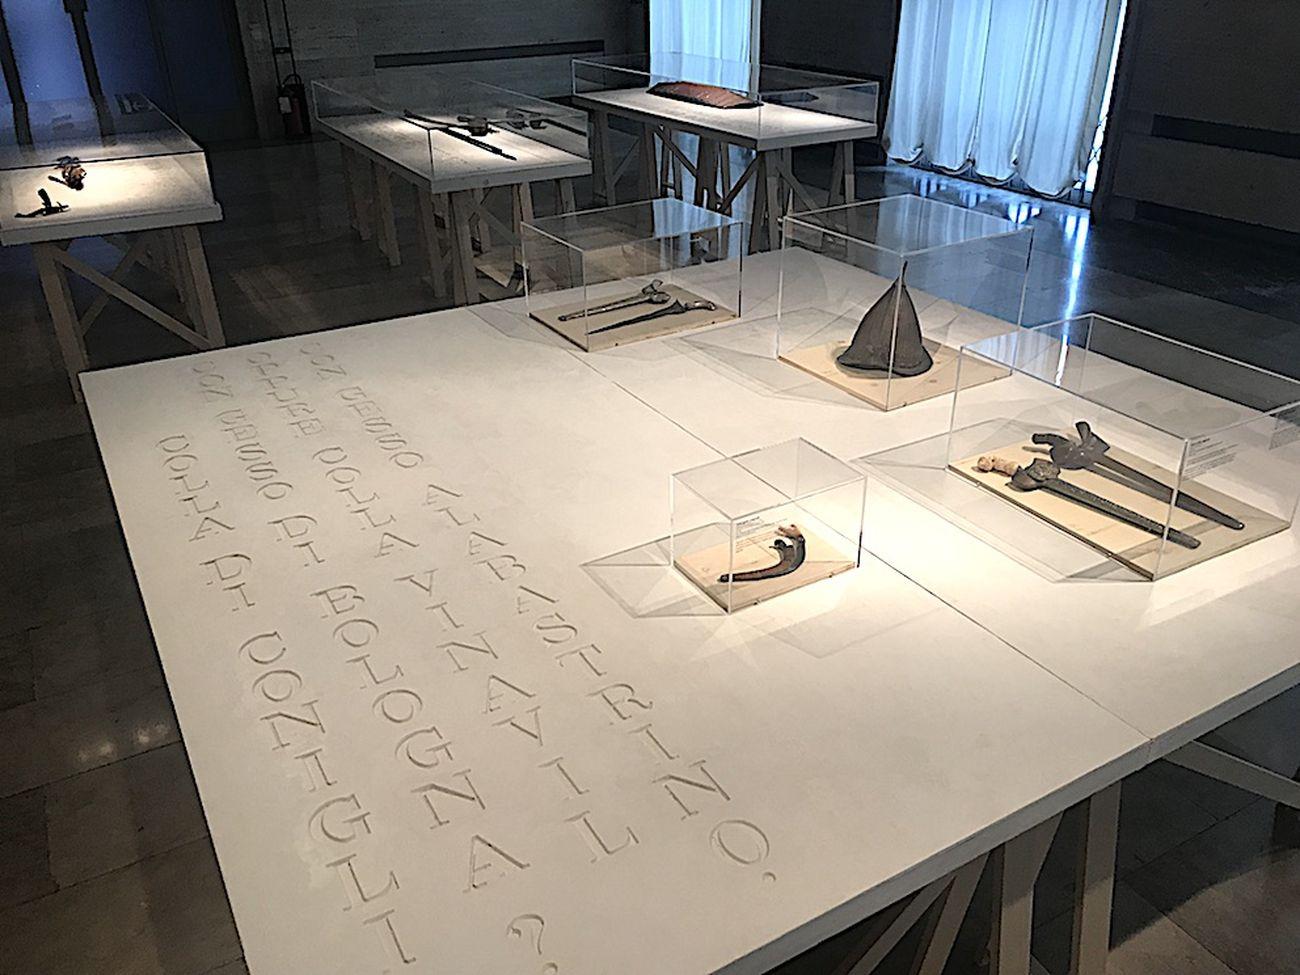 H.H. Lim. Origine del dettaglio. Exhibition view at Museo Preistorico Etnografico Luigi Pigorini, Roma 2018